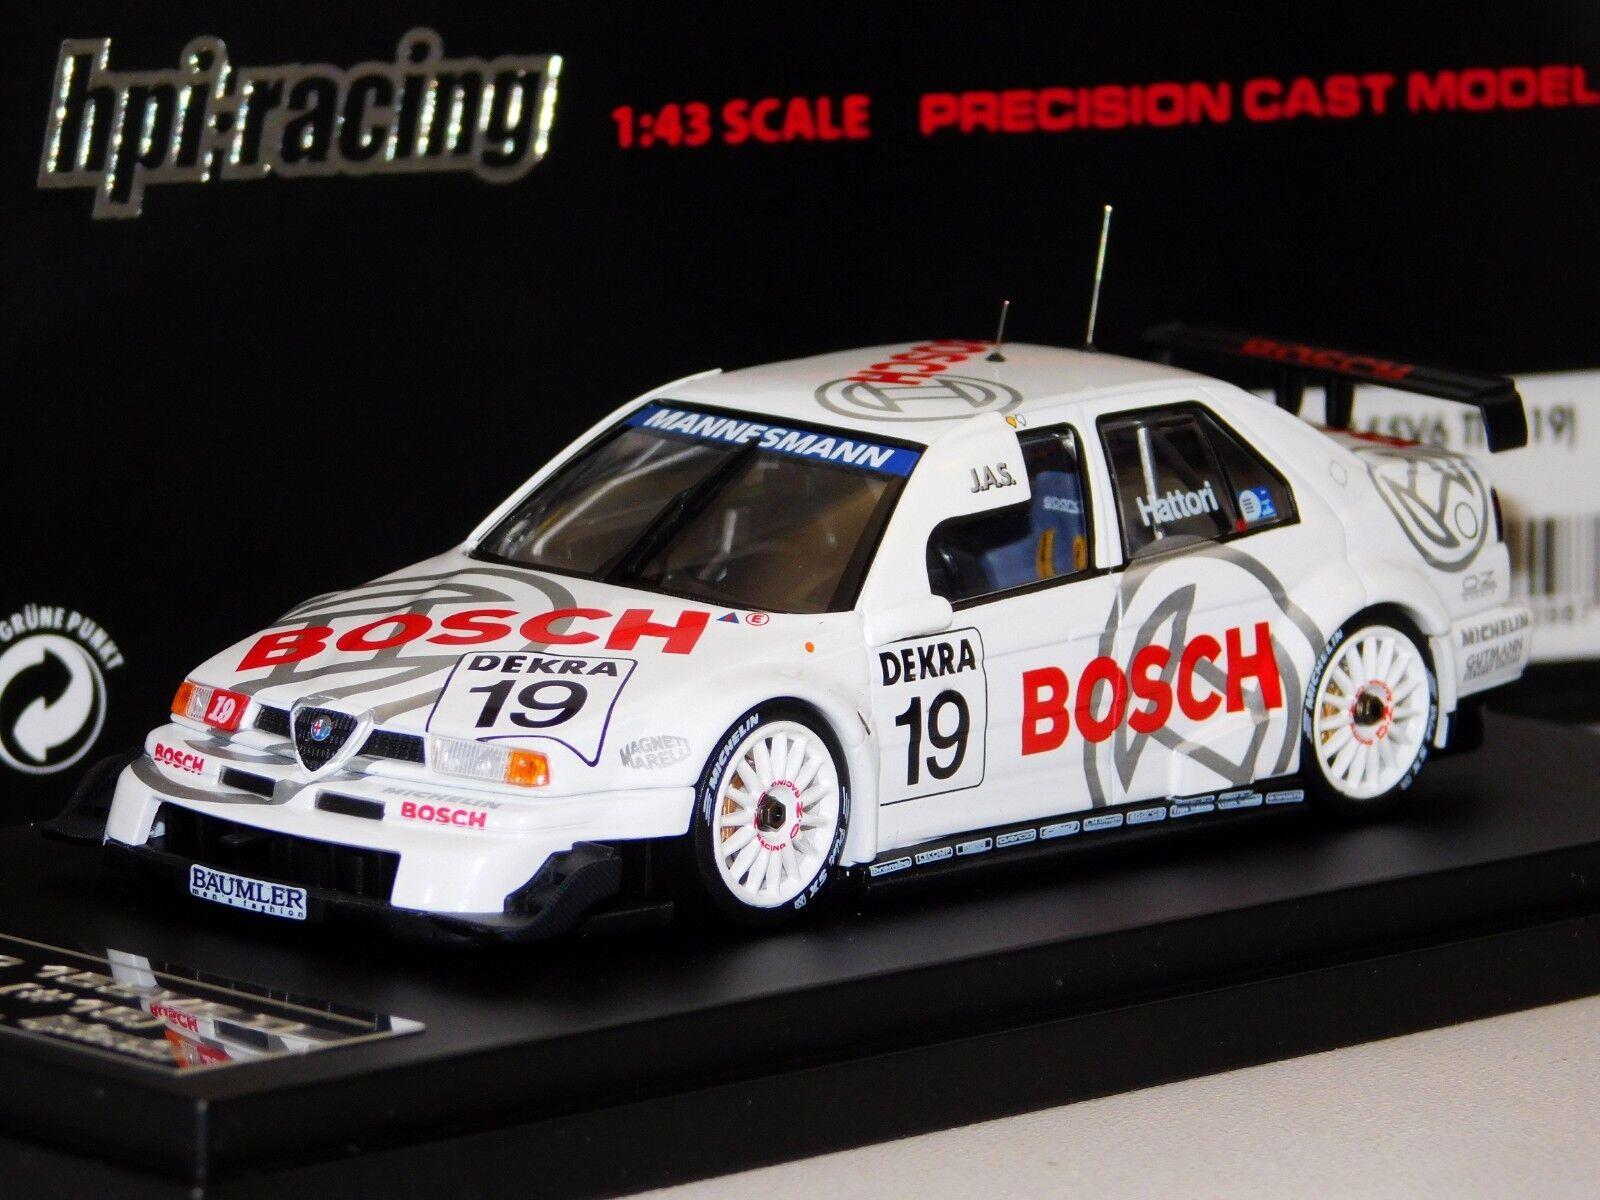 ALFA ROMEO 155 V6 TI BOSCH  19 ITC 1996 HPI 8098 1 43